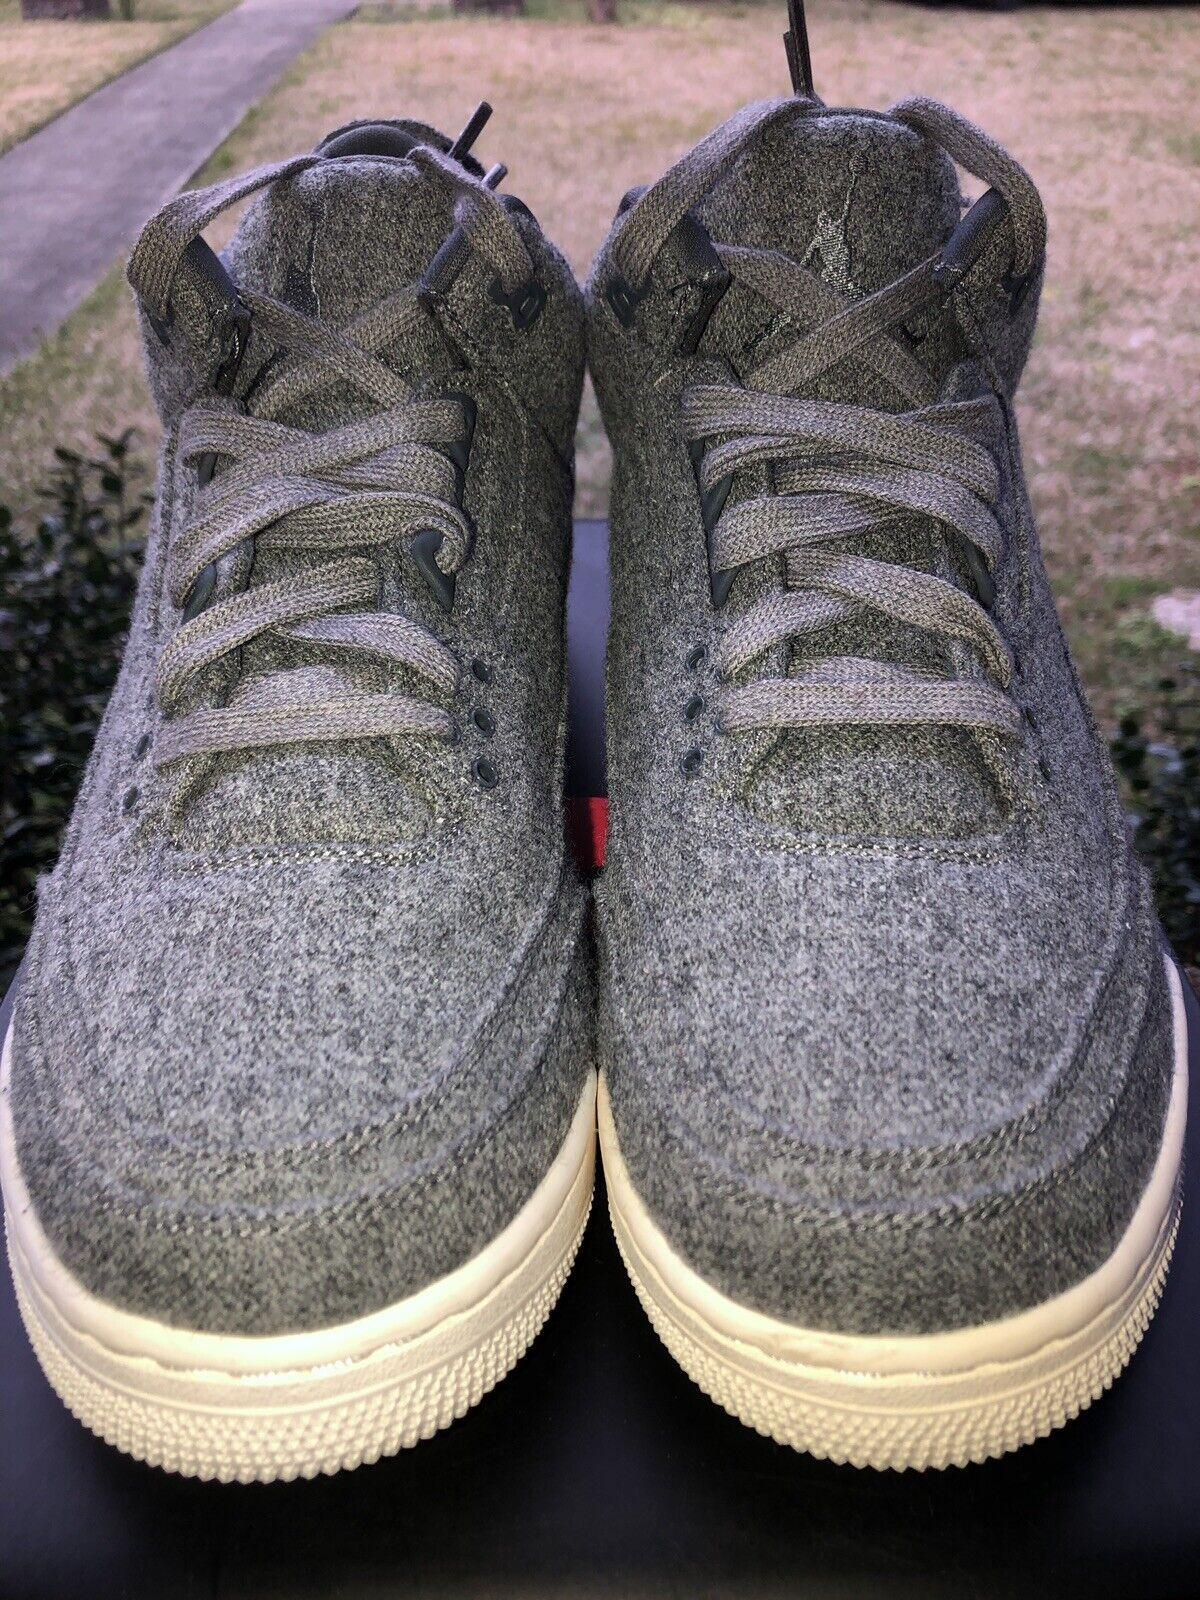 Nike Air Jordan Retro 3  Wool   Sz. 12 Grey 854263 004 VNDS 100% Seller Clean